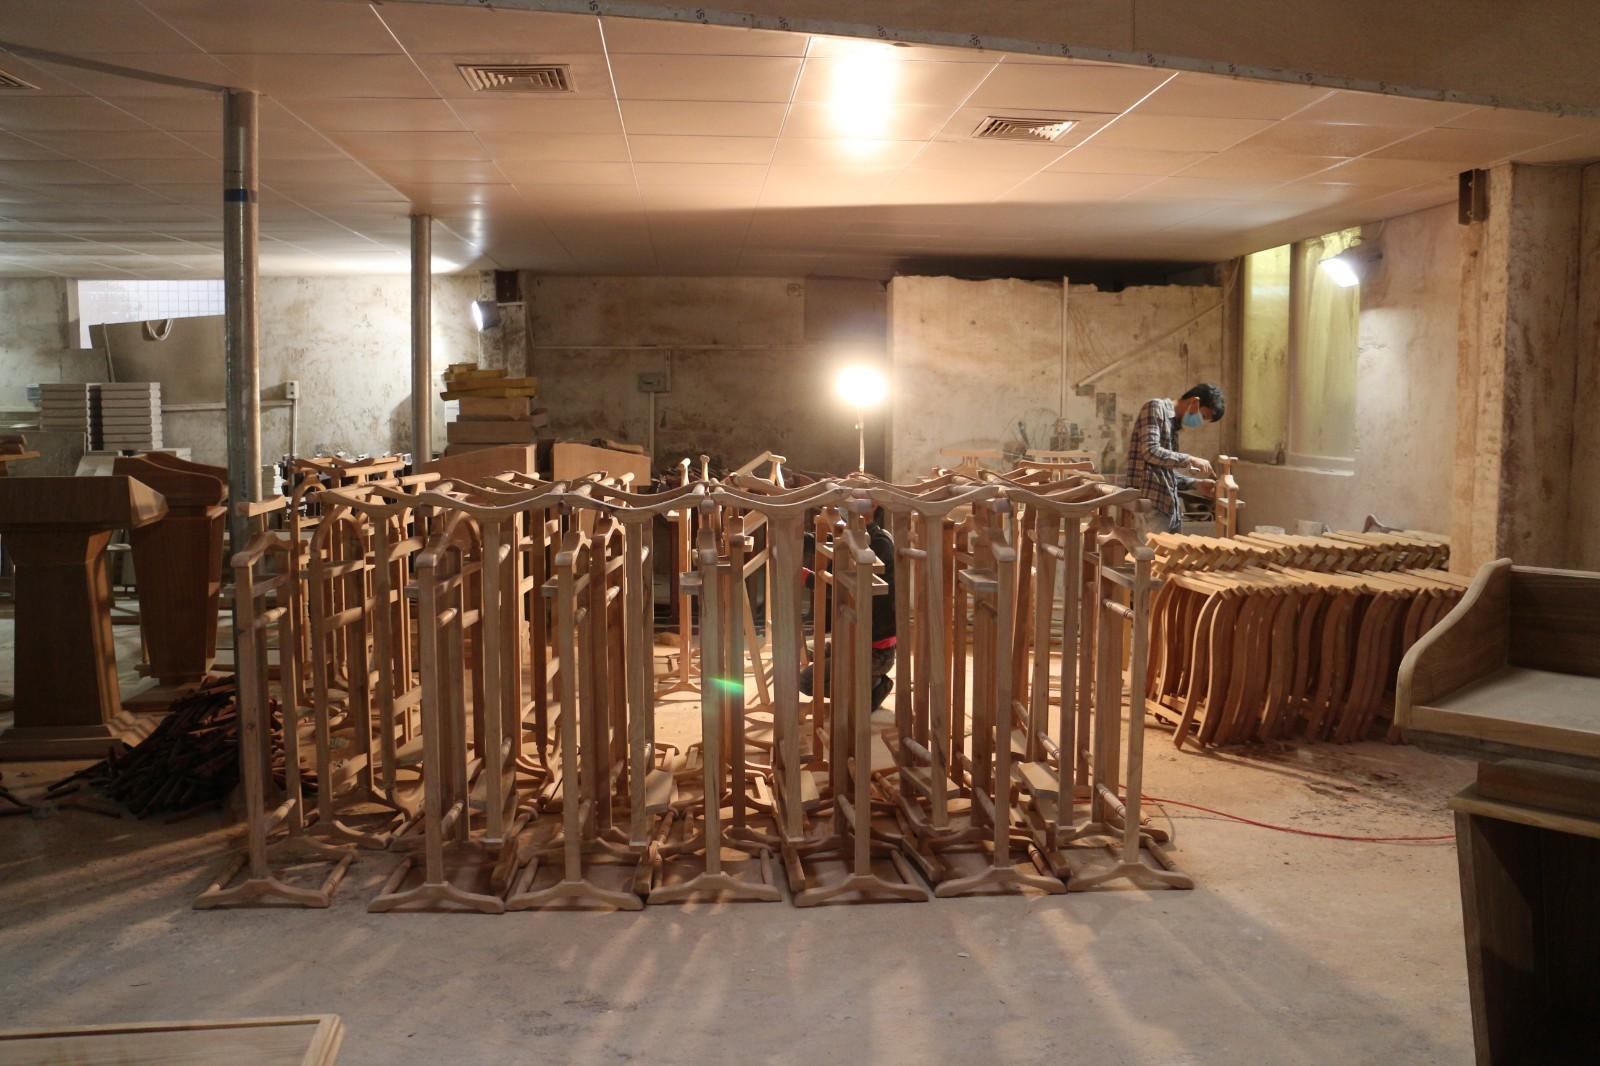 Fenghe-Oem Coat Hanger Stand Manufacturer, Metal Coat Rack | Fenghe-3